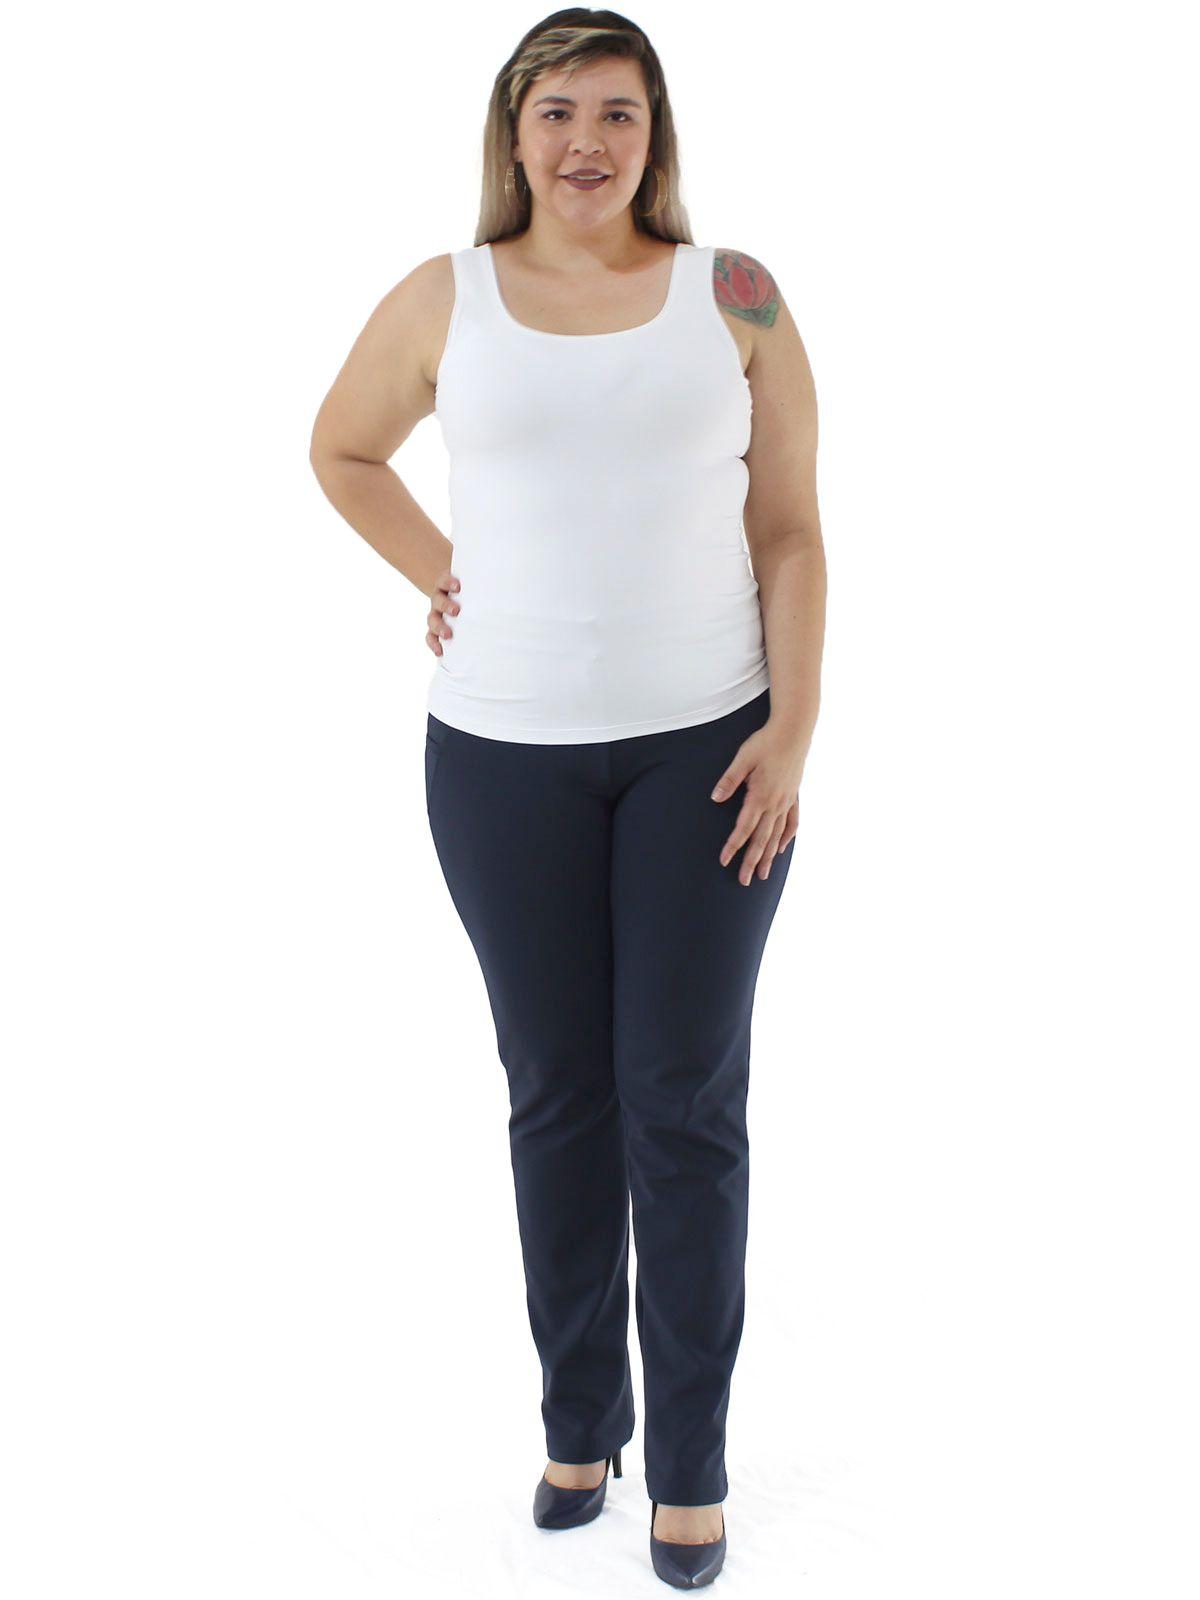 Regata Plus Size Feminina Lisa Fitness De Poliamida Branca